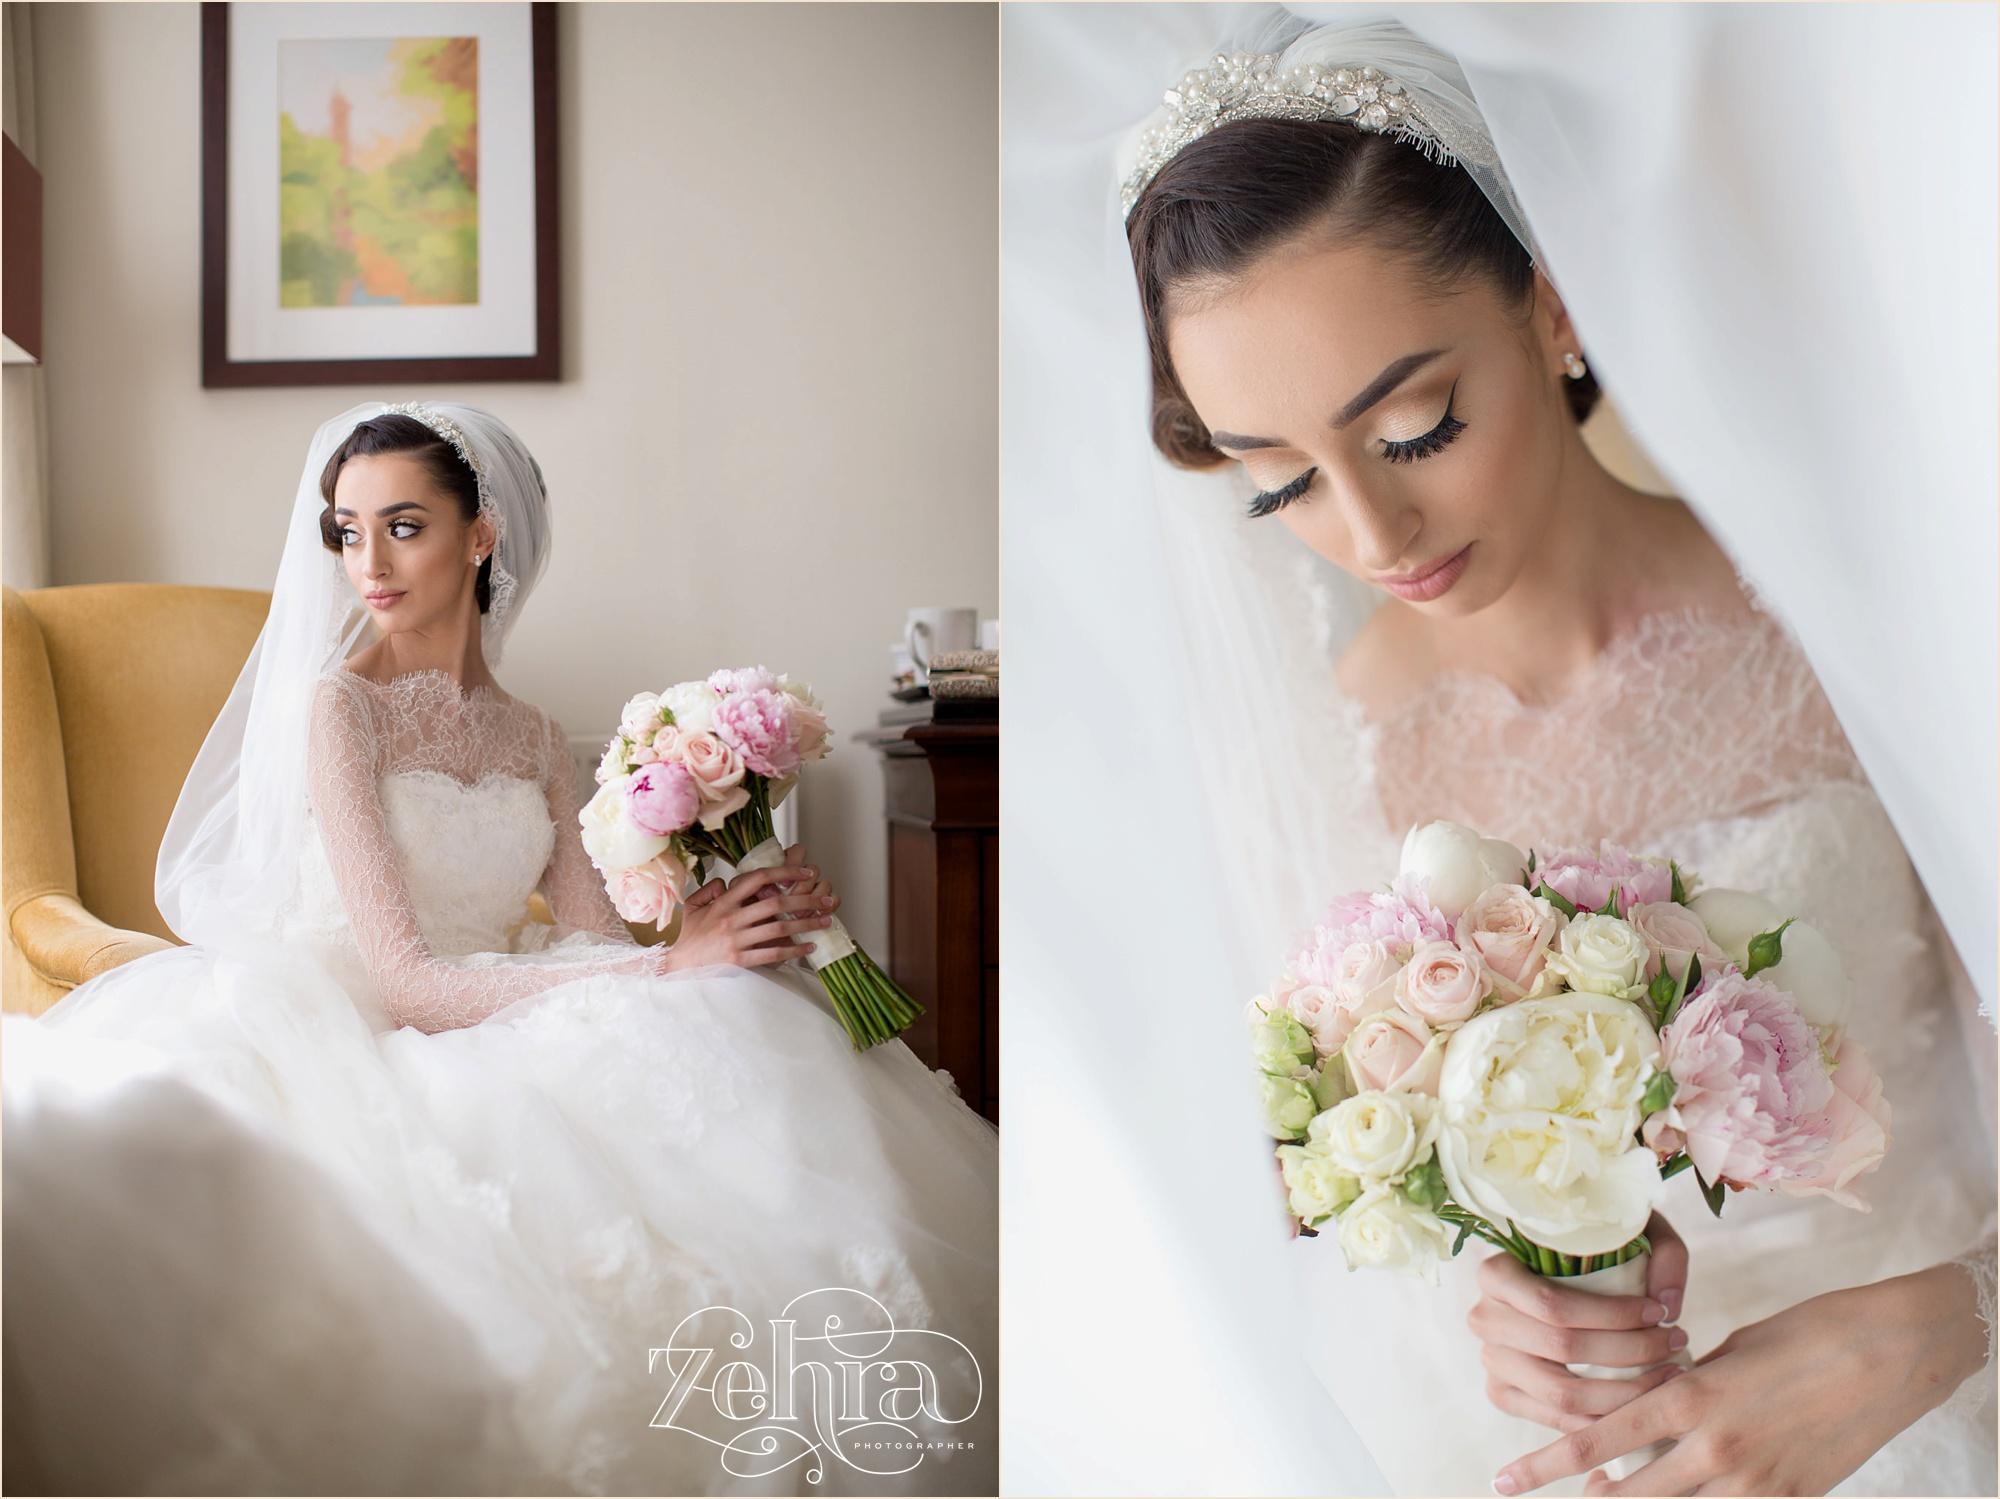 jasira manchester wedding photographer_0016.jpg